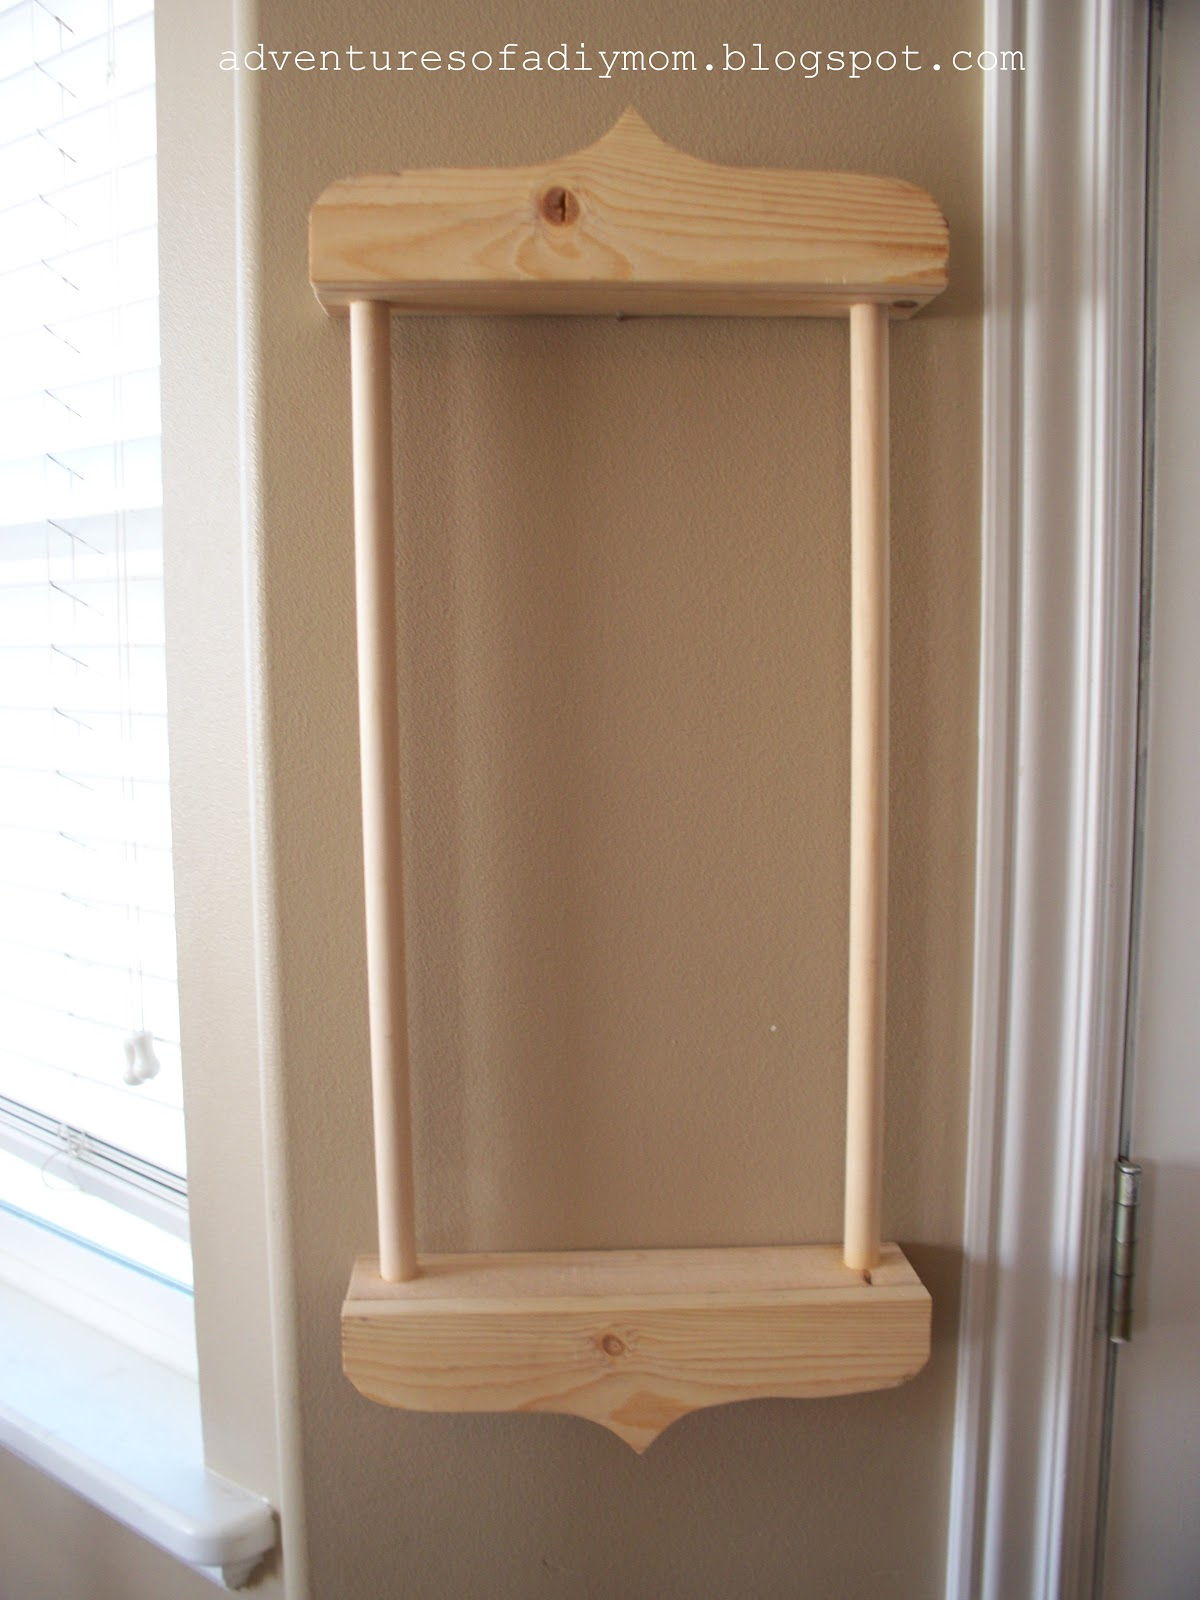 Karate belt display ideas - How To Build A Karate Belt Holder